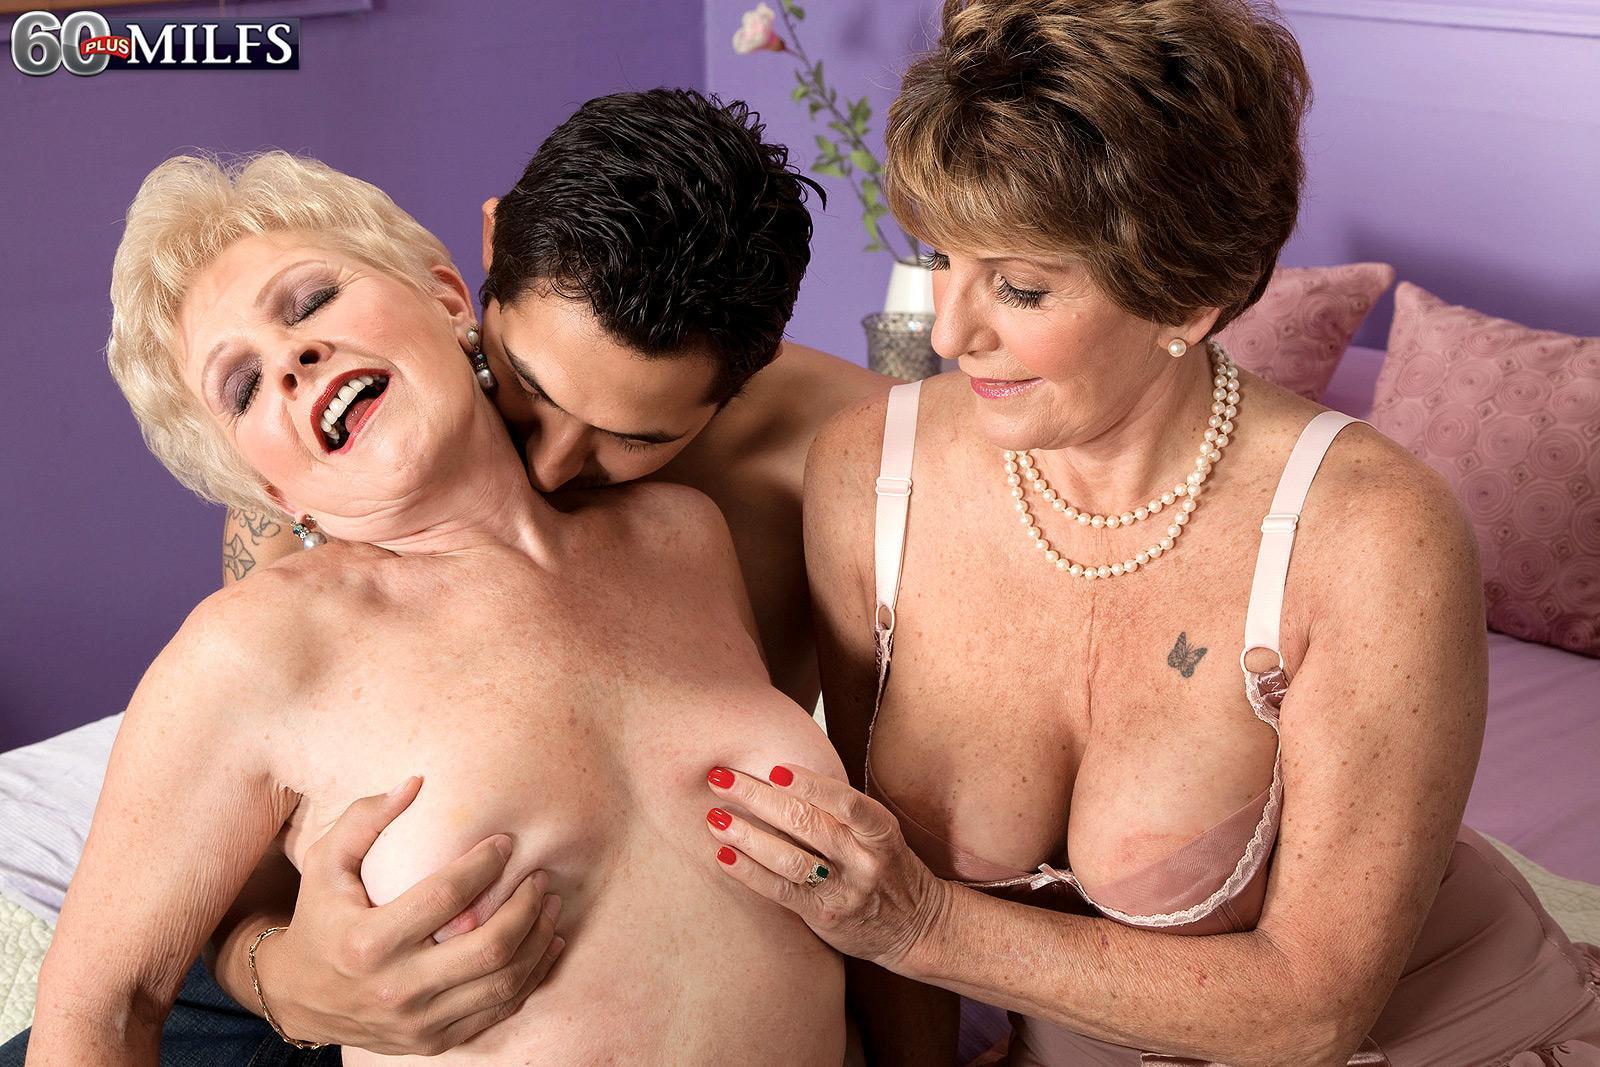 Naughty grannys Bea Cummins and Jewel tongue smooch and give big wood dual oral jobs